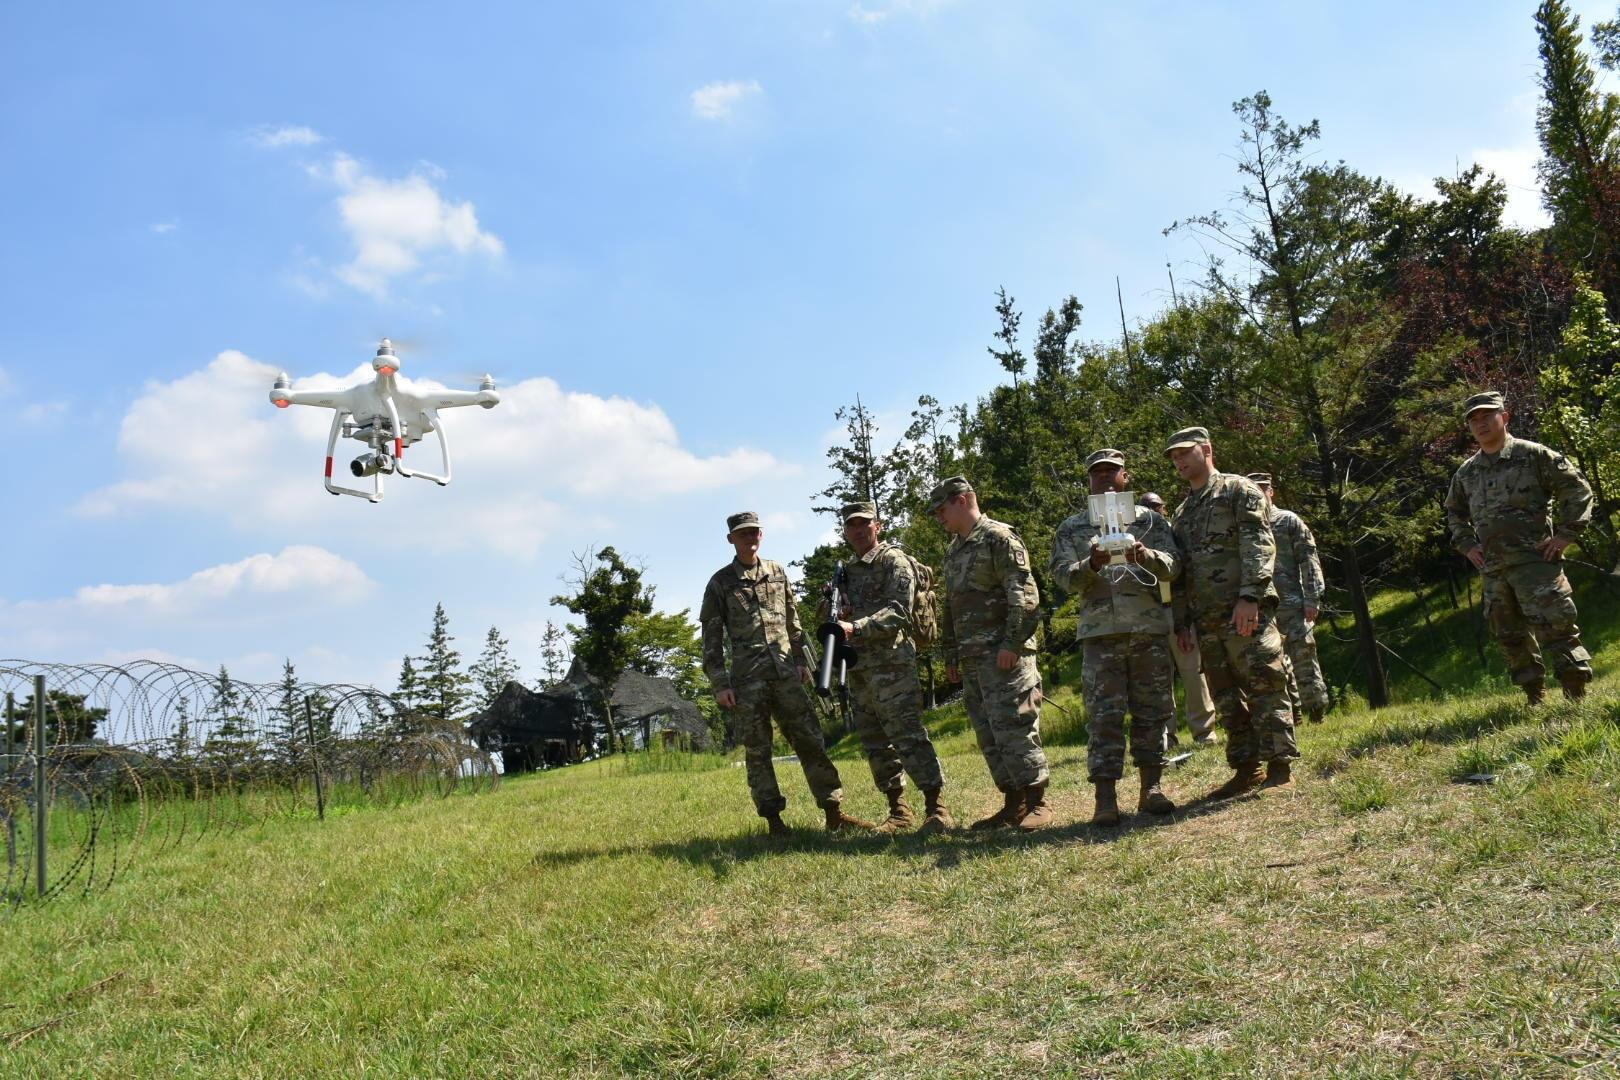 South Korea-based Short Range Air Defense Battery Integrates Counter-UAS into Core Competencies